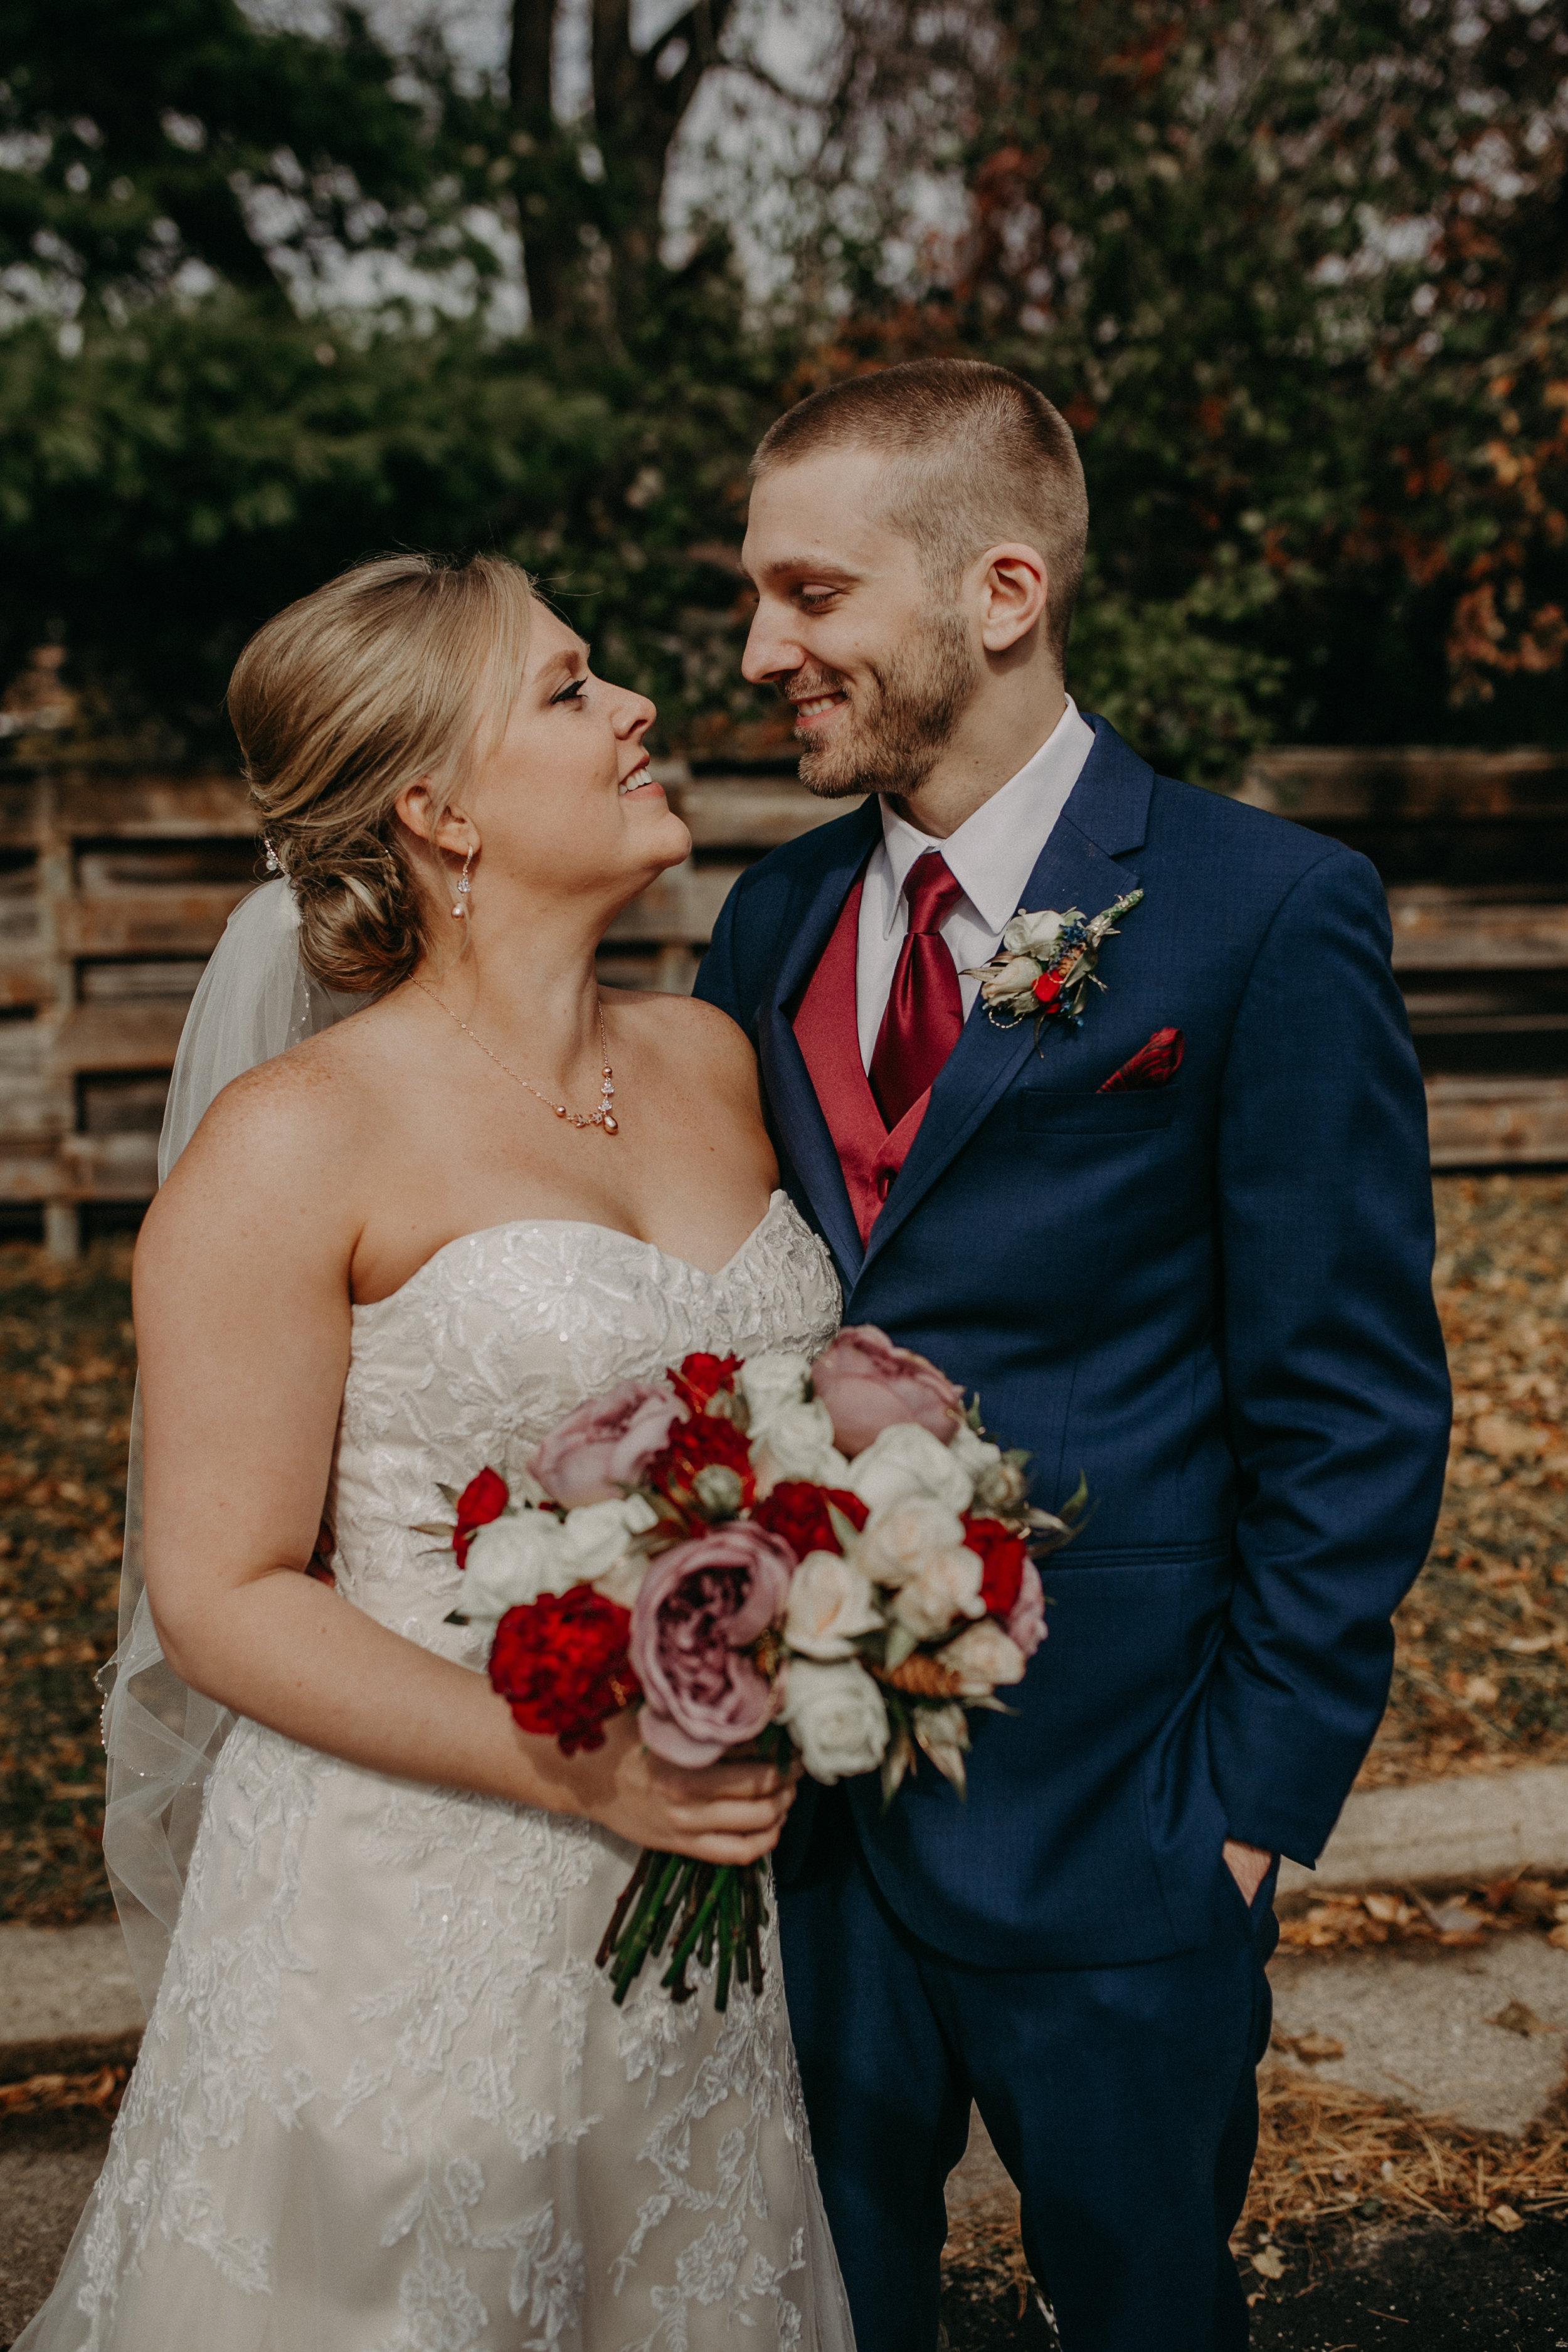 Weisenbeck_Wedding_Oct2018-233.jpg